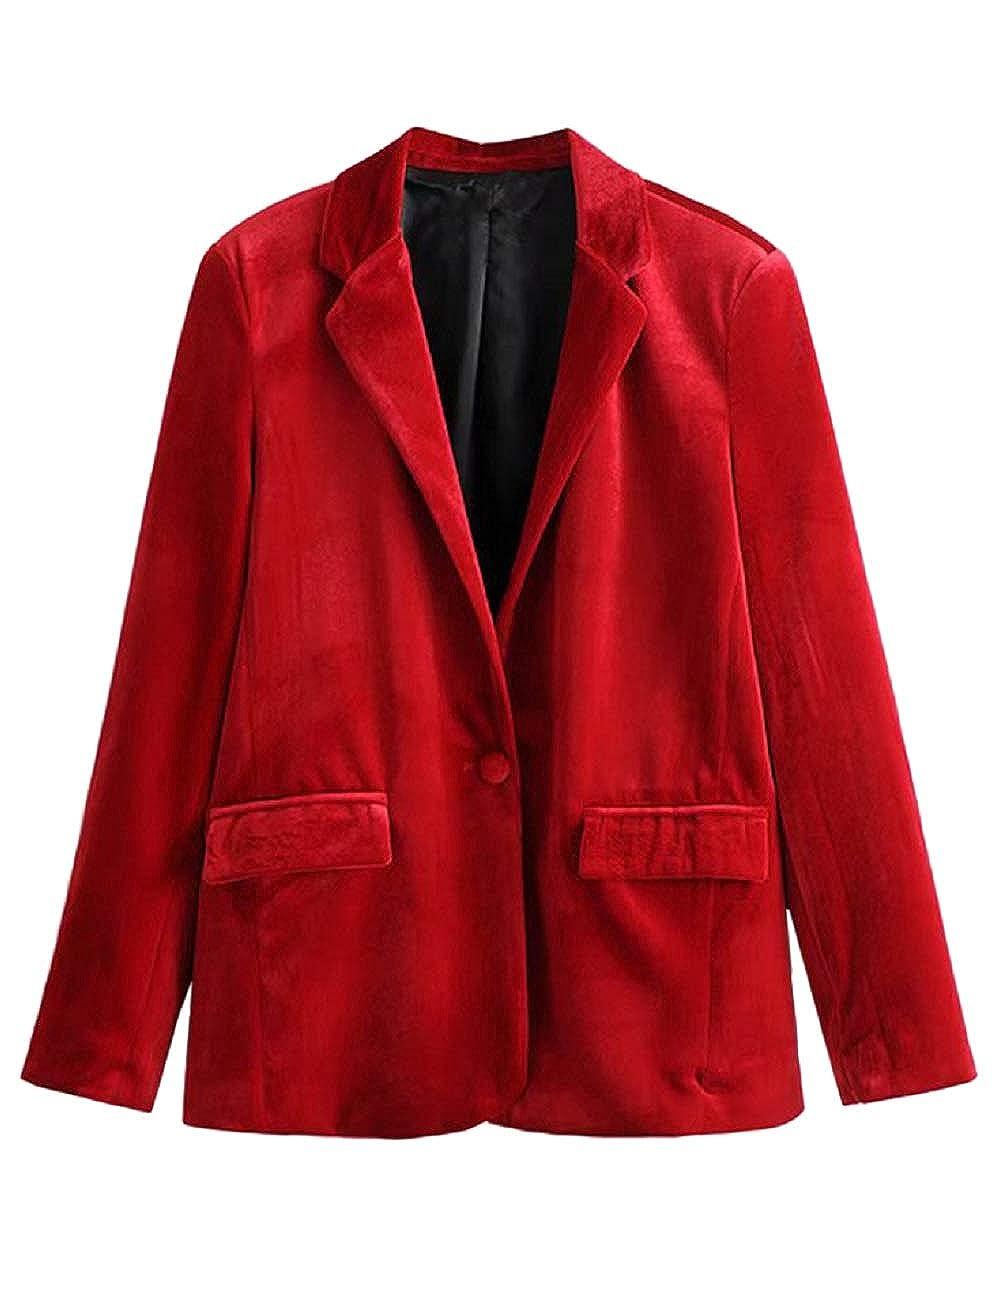 SEBOWEL Donna Un Pulsante Velluto Giacca Slim Fit Casual Blazer Jacket Suit